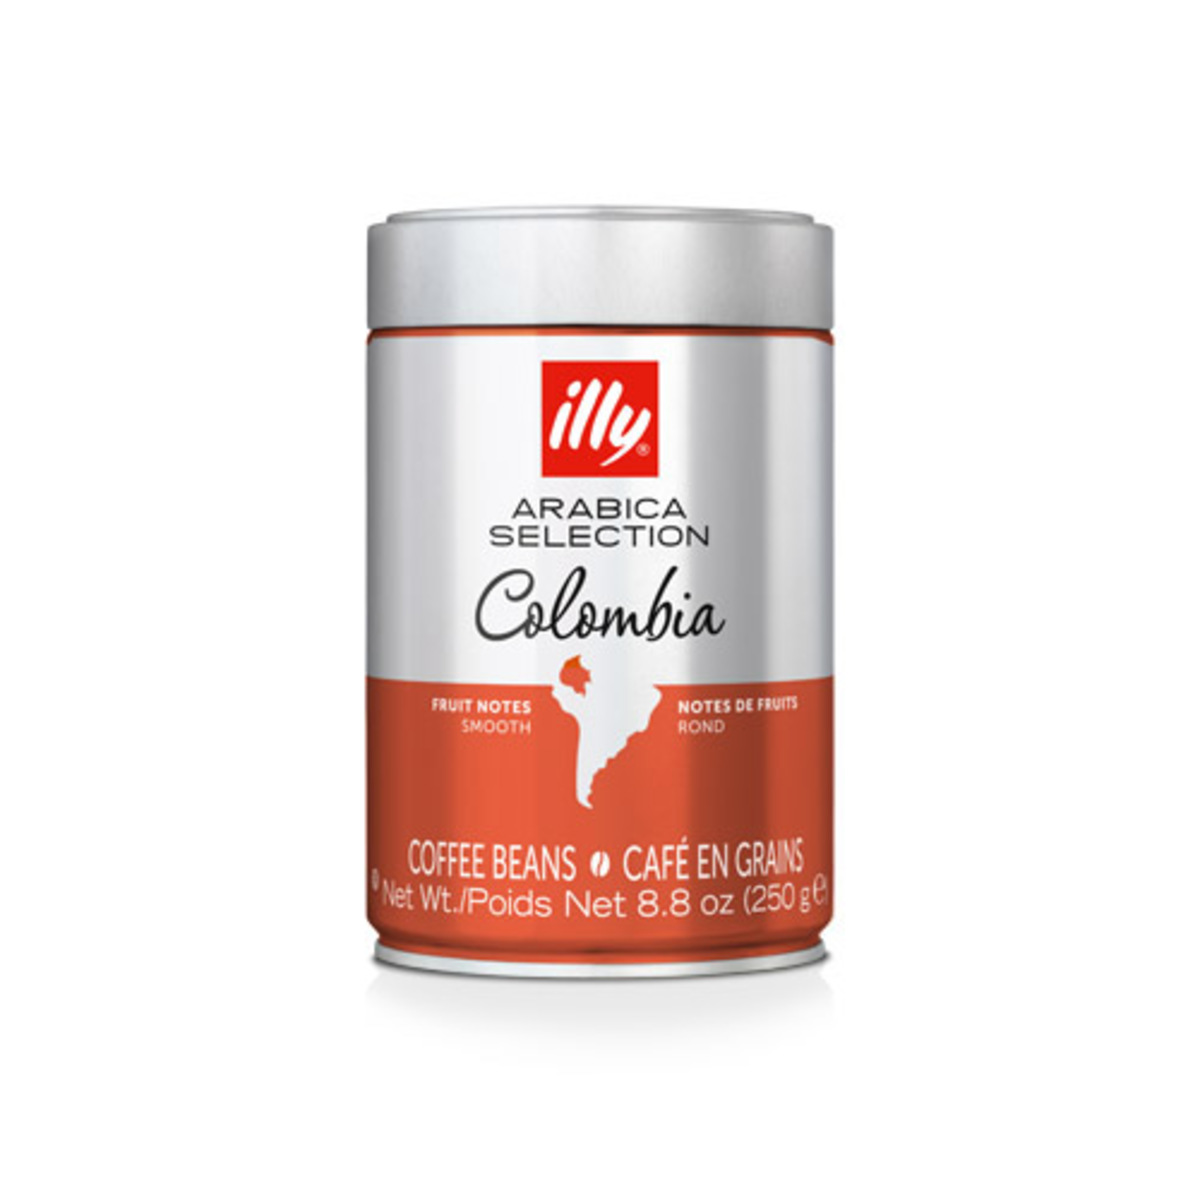 Single Origin Coffee Beans - Colombia